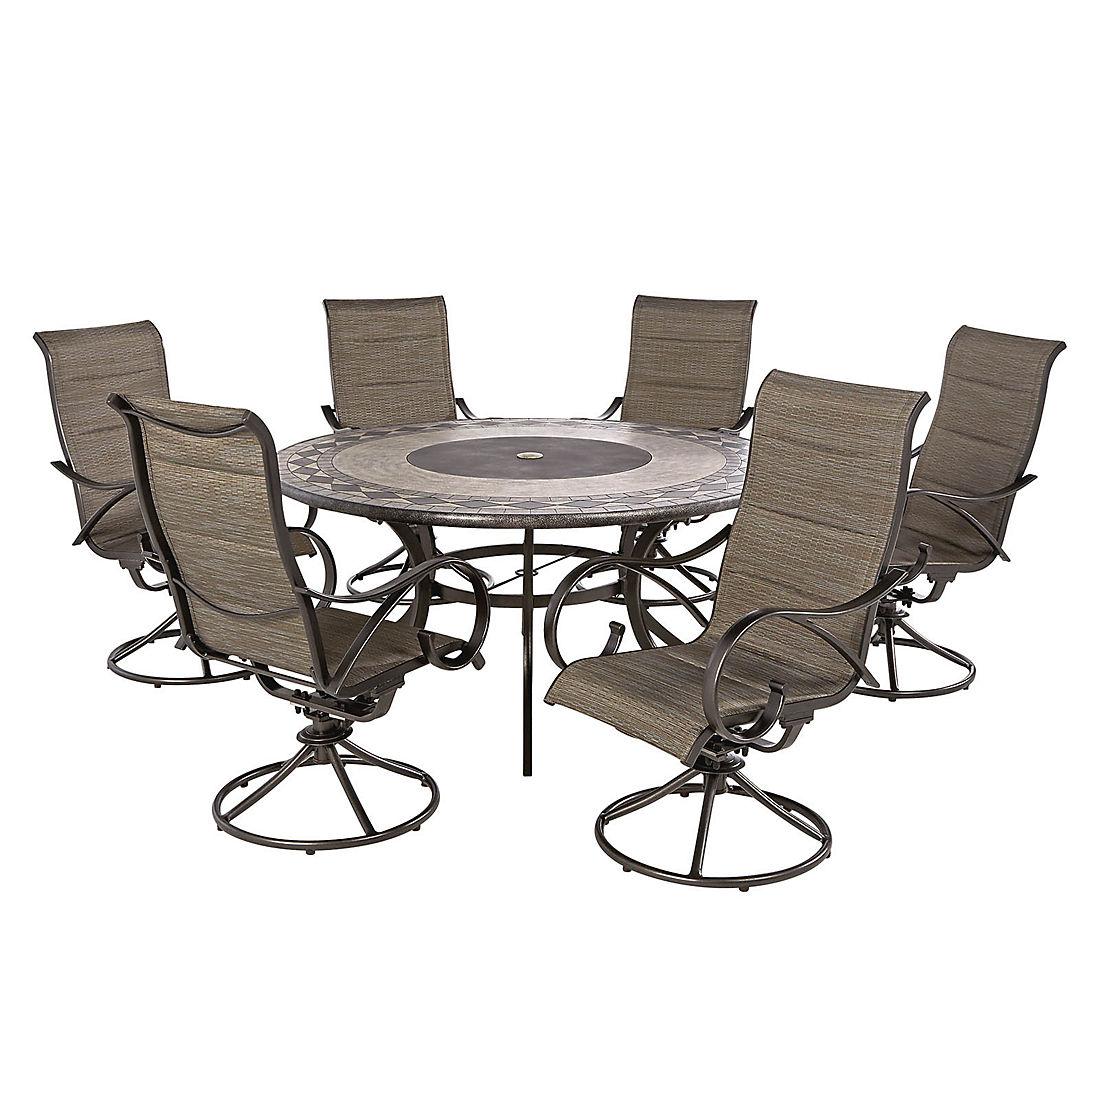 Excellent Berkley Jensen Seaport 7 Pc Padded Sling Dining Set Cjindustries Chair Design For Home Cjindustriesco